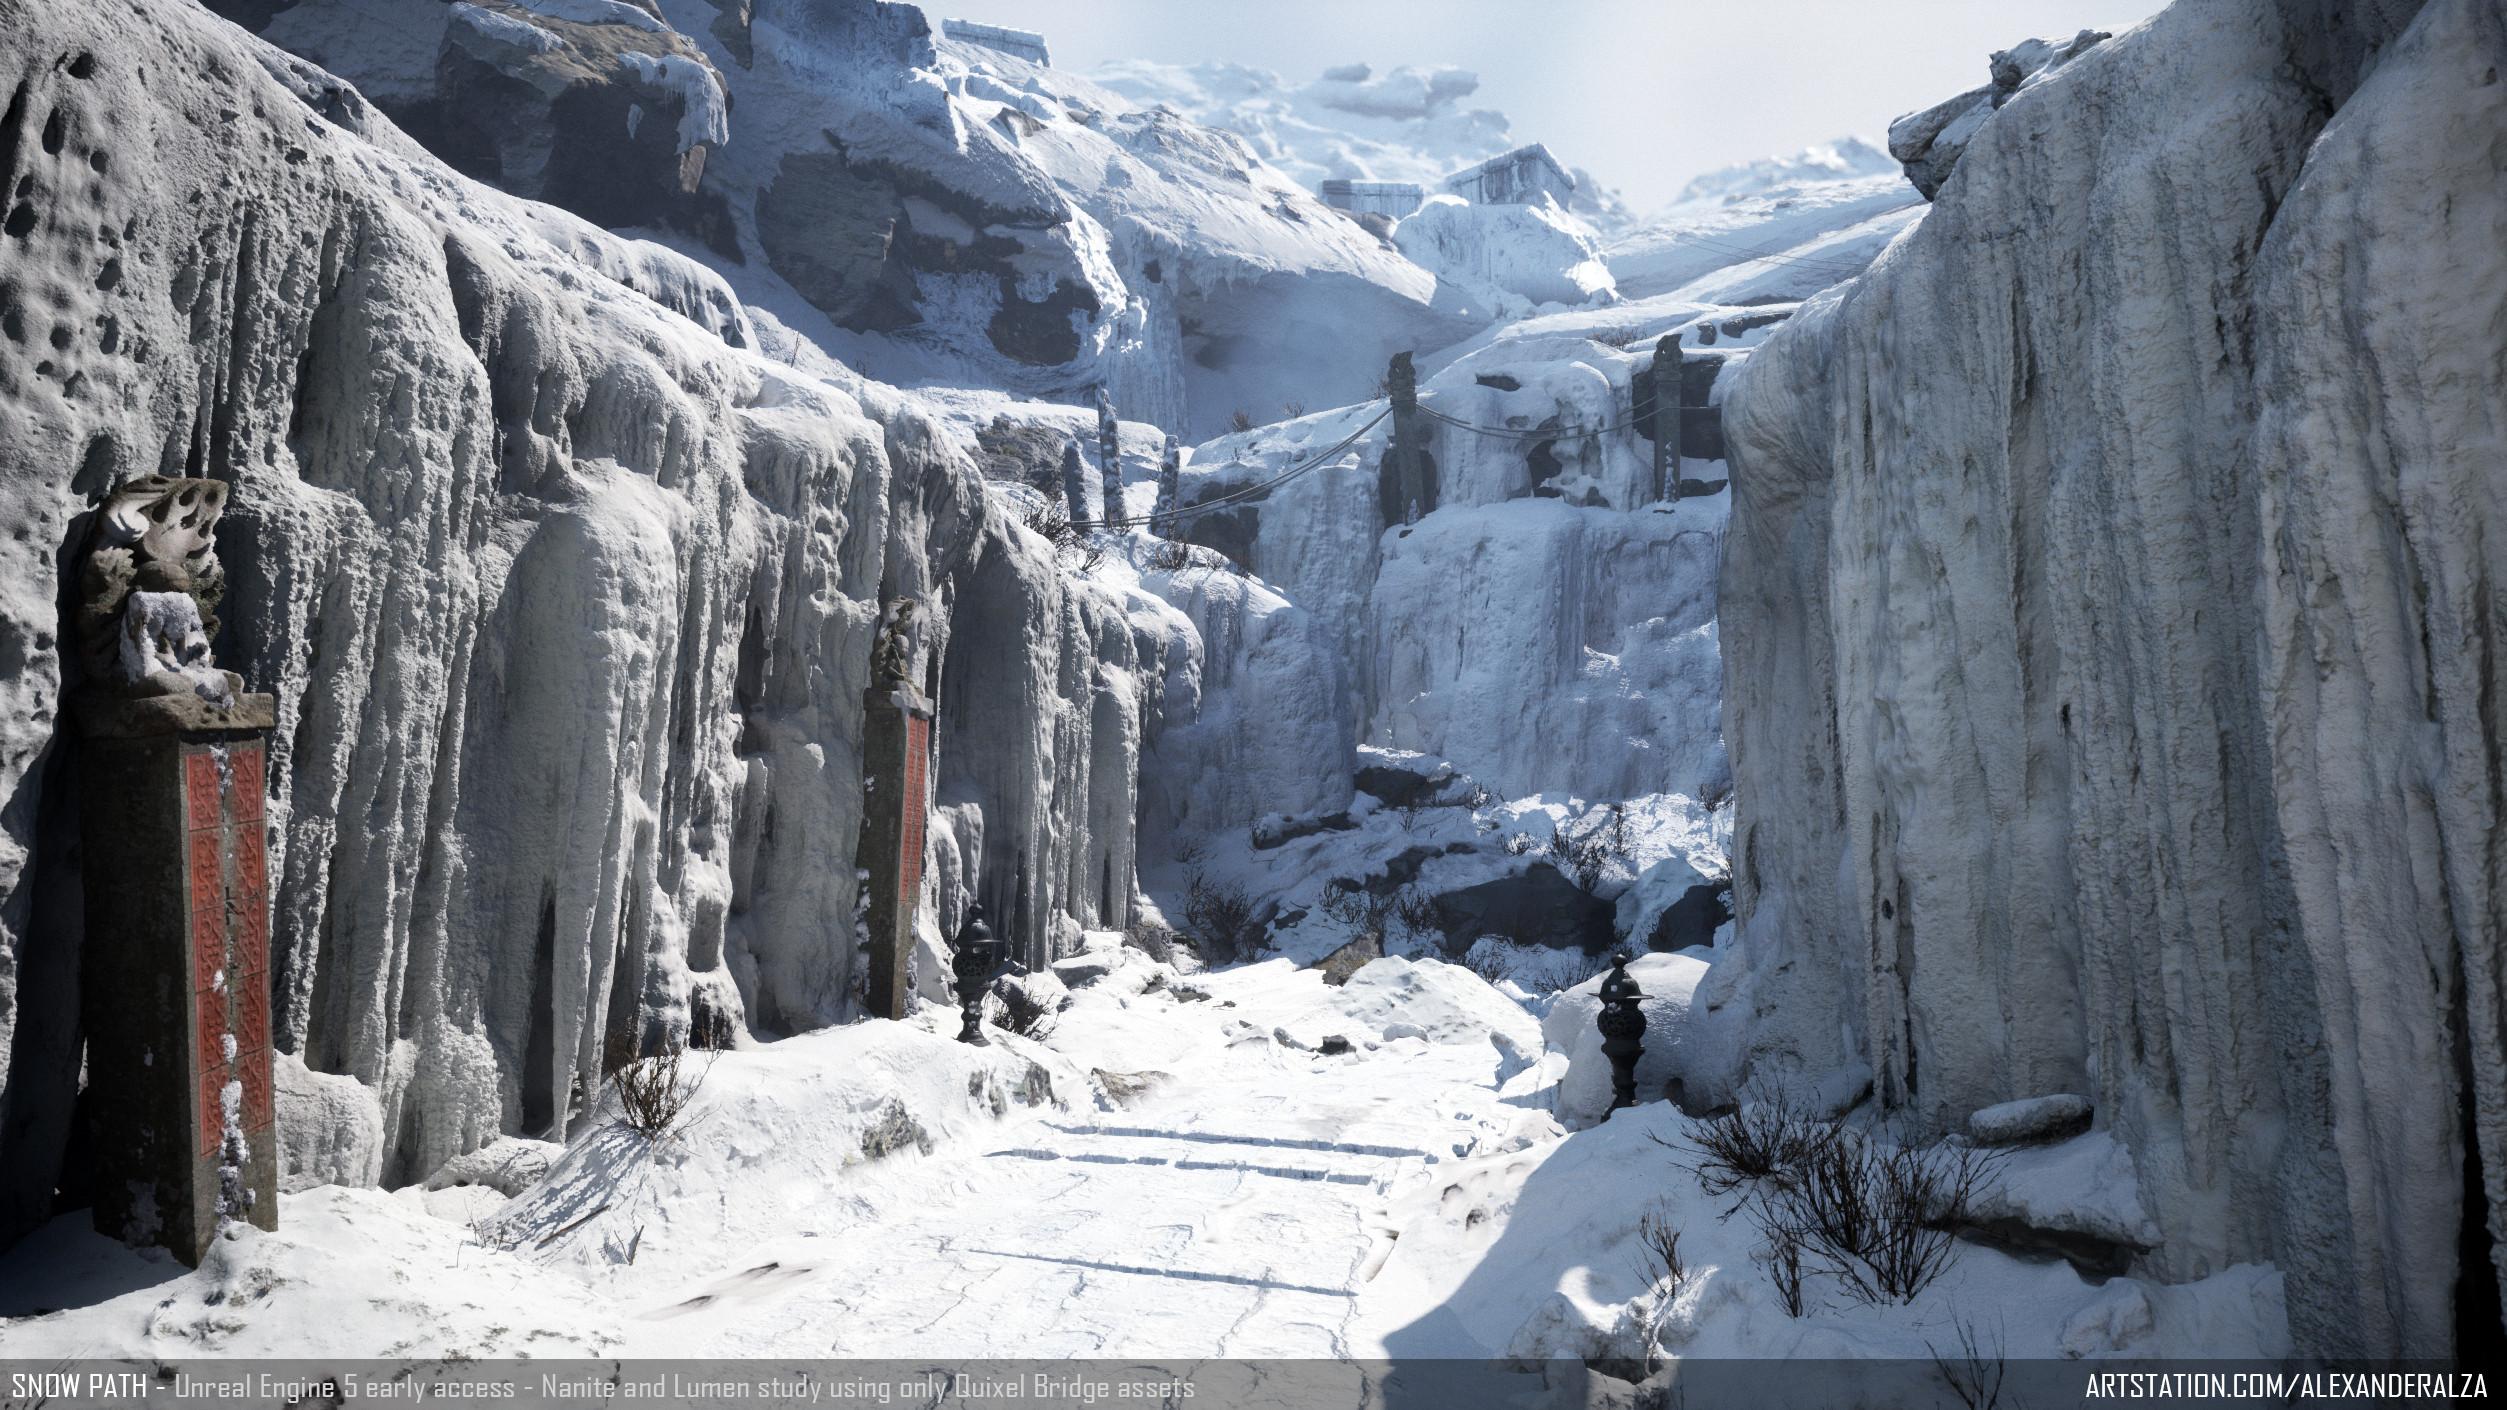 Snow Path - shot 1